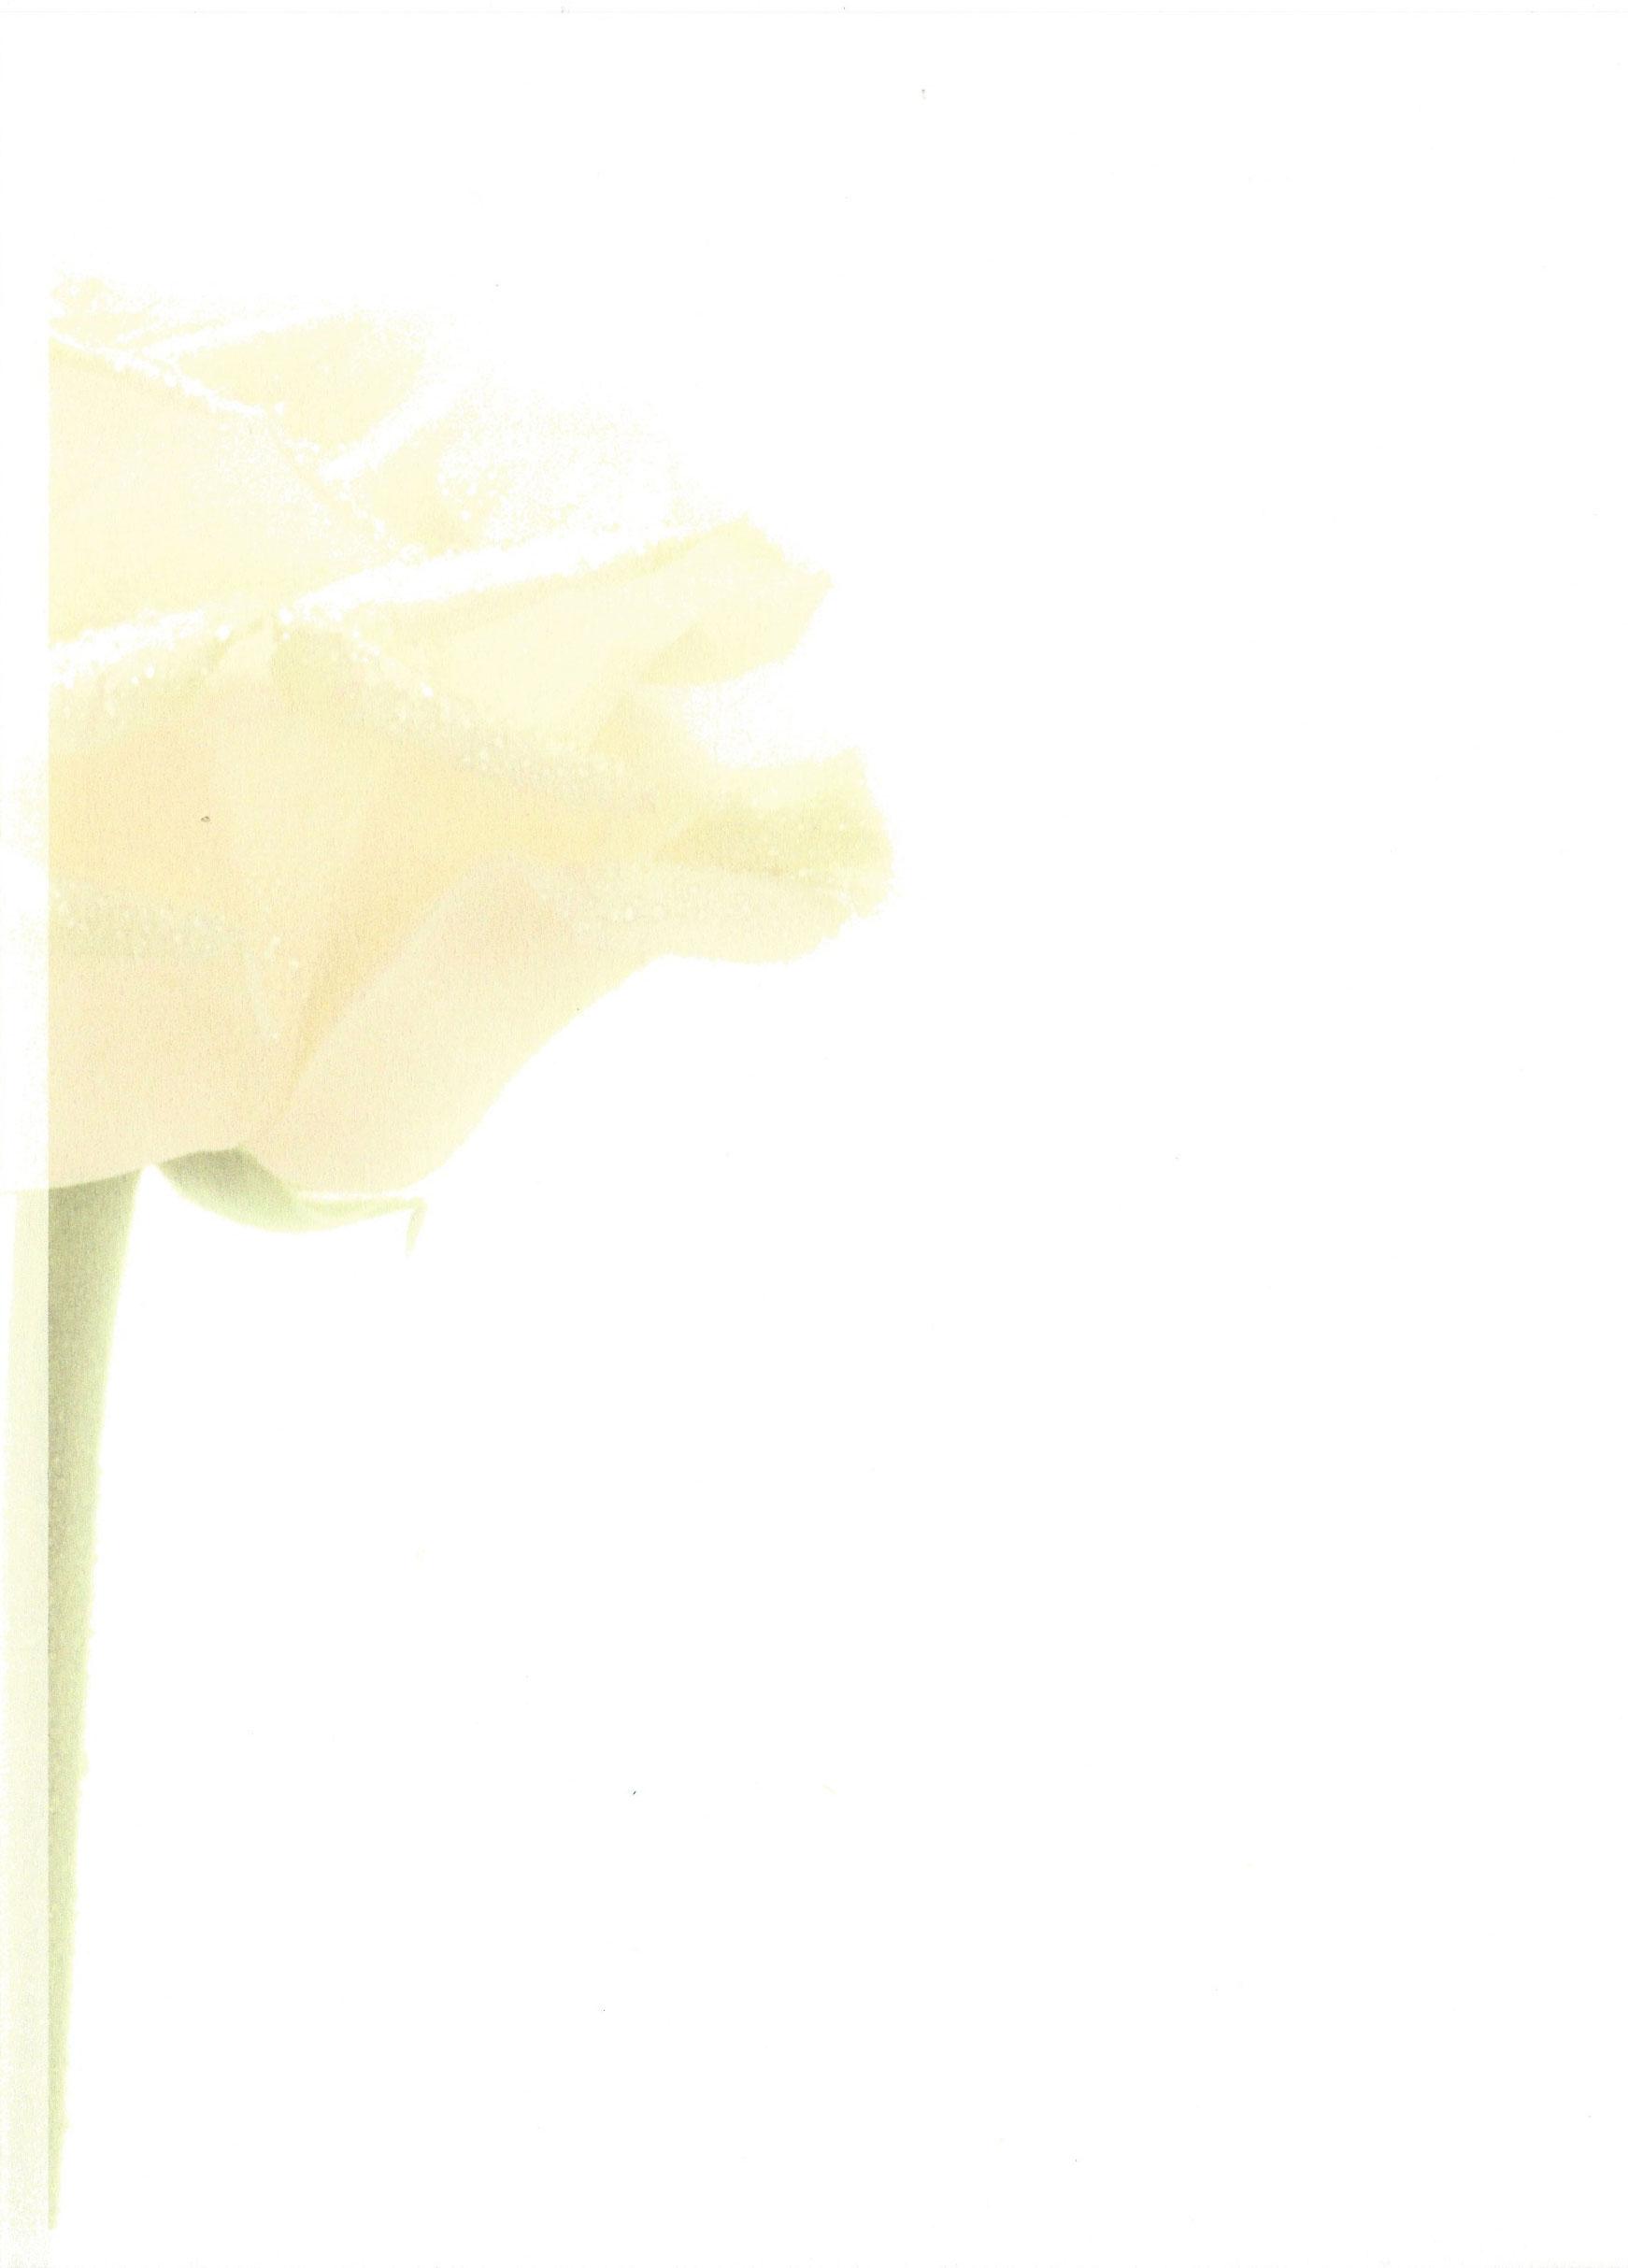 Grote Witte Roos Rouwkaart Rouwcirculaire Dankbetuiging